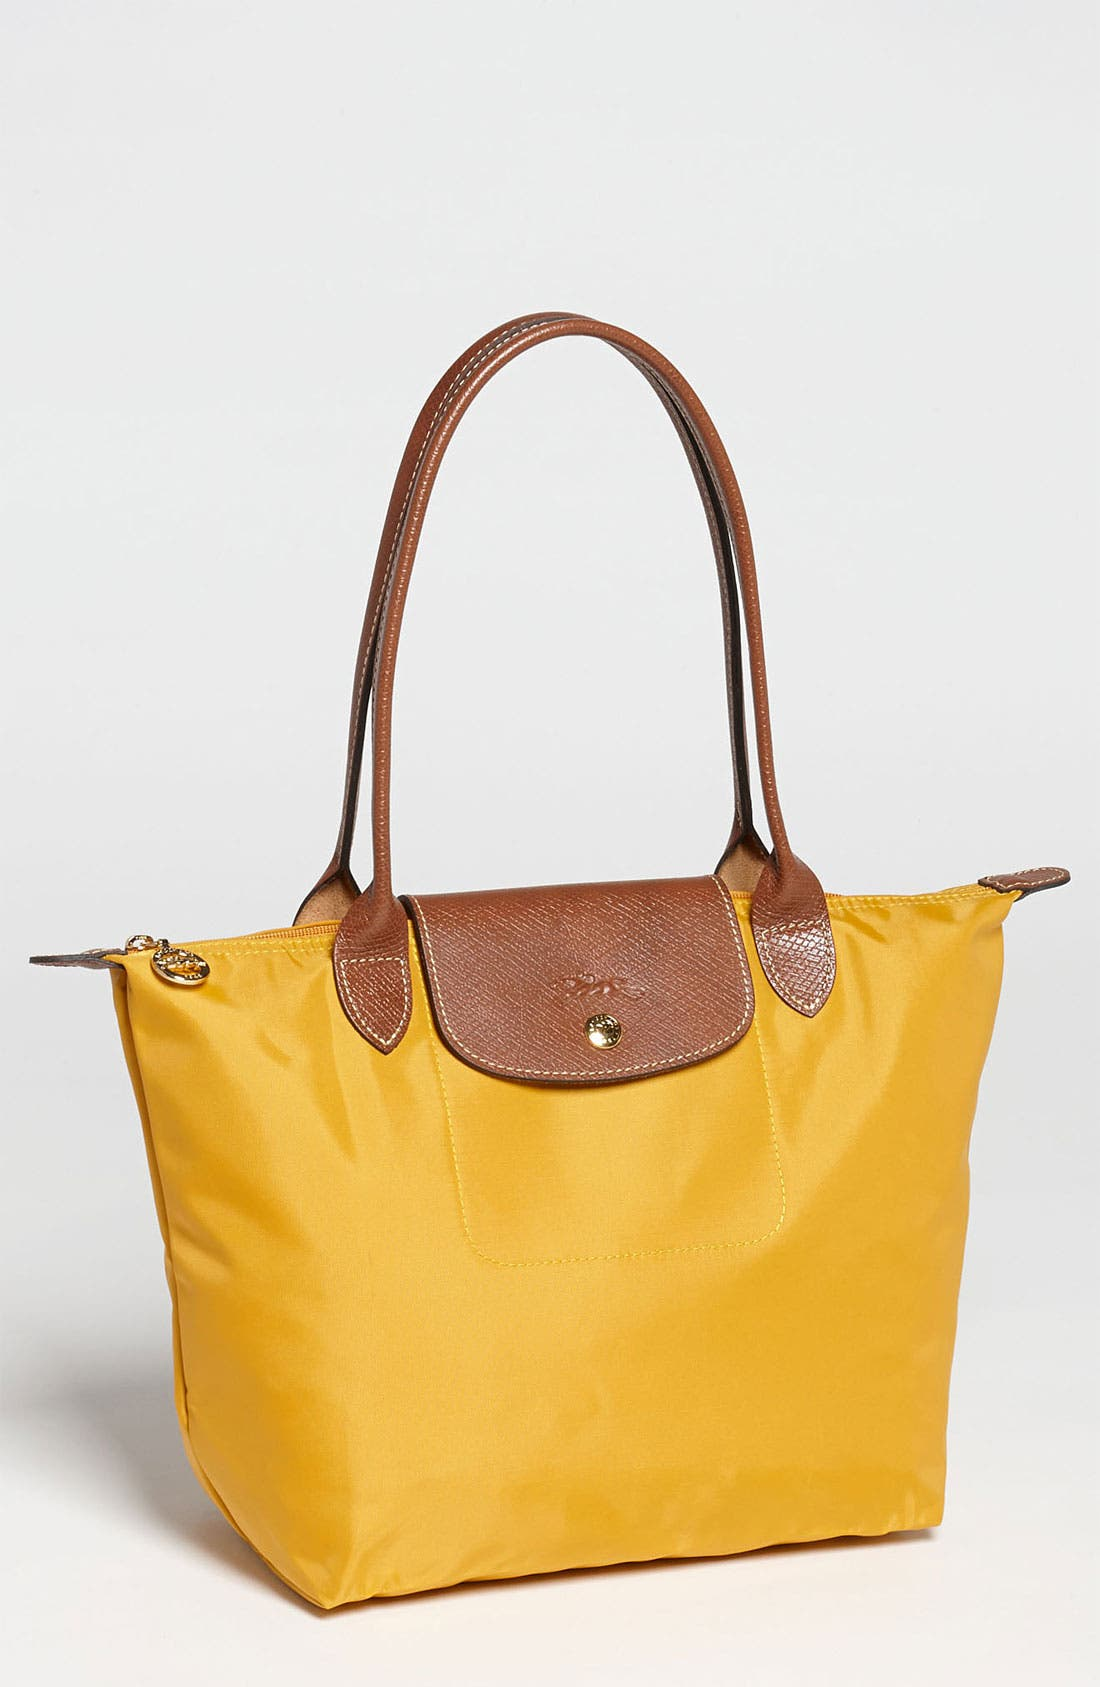 Alternate Image 1 Selected - Longchamp 'Small Le Pliage' Shoulder Tote